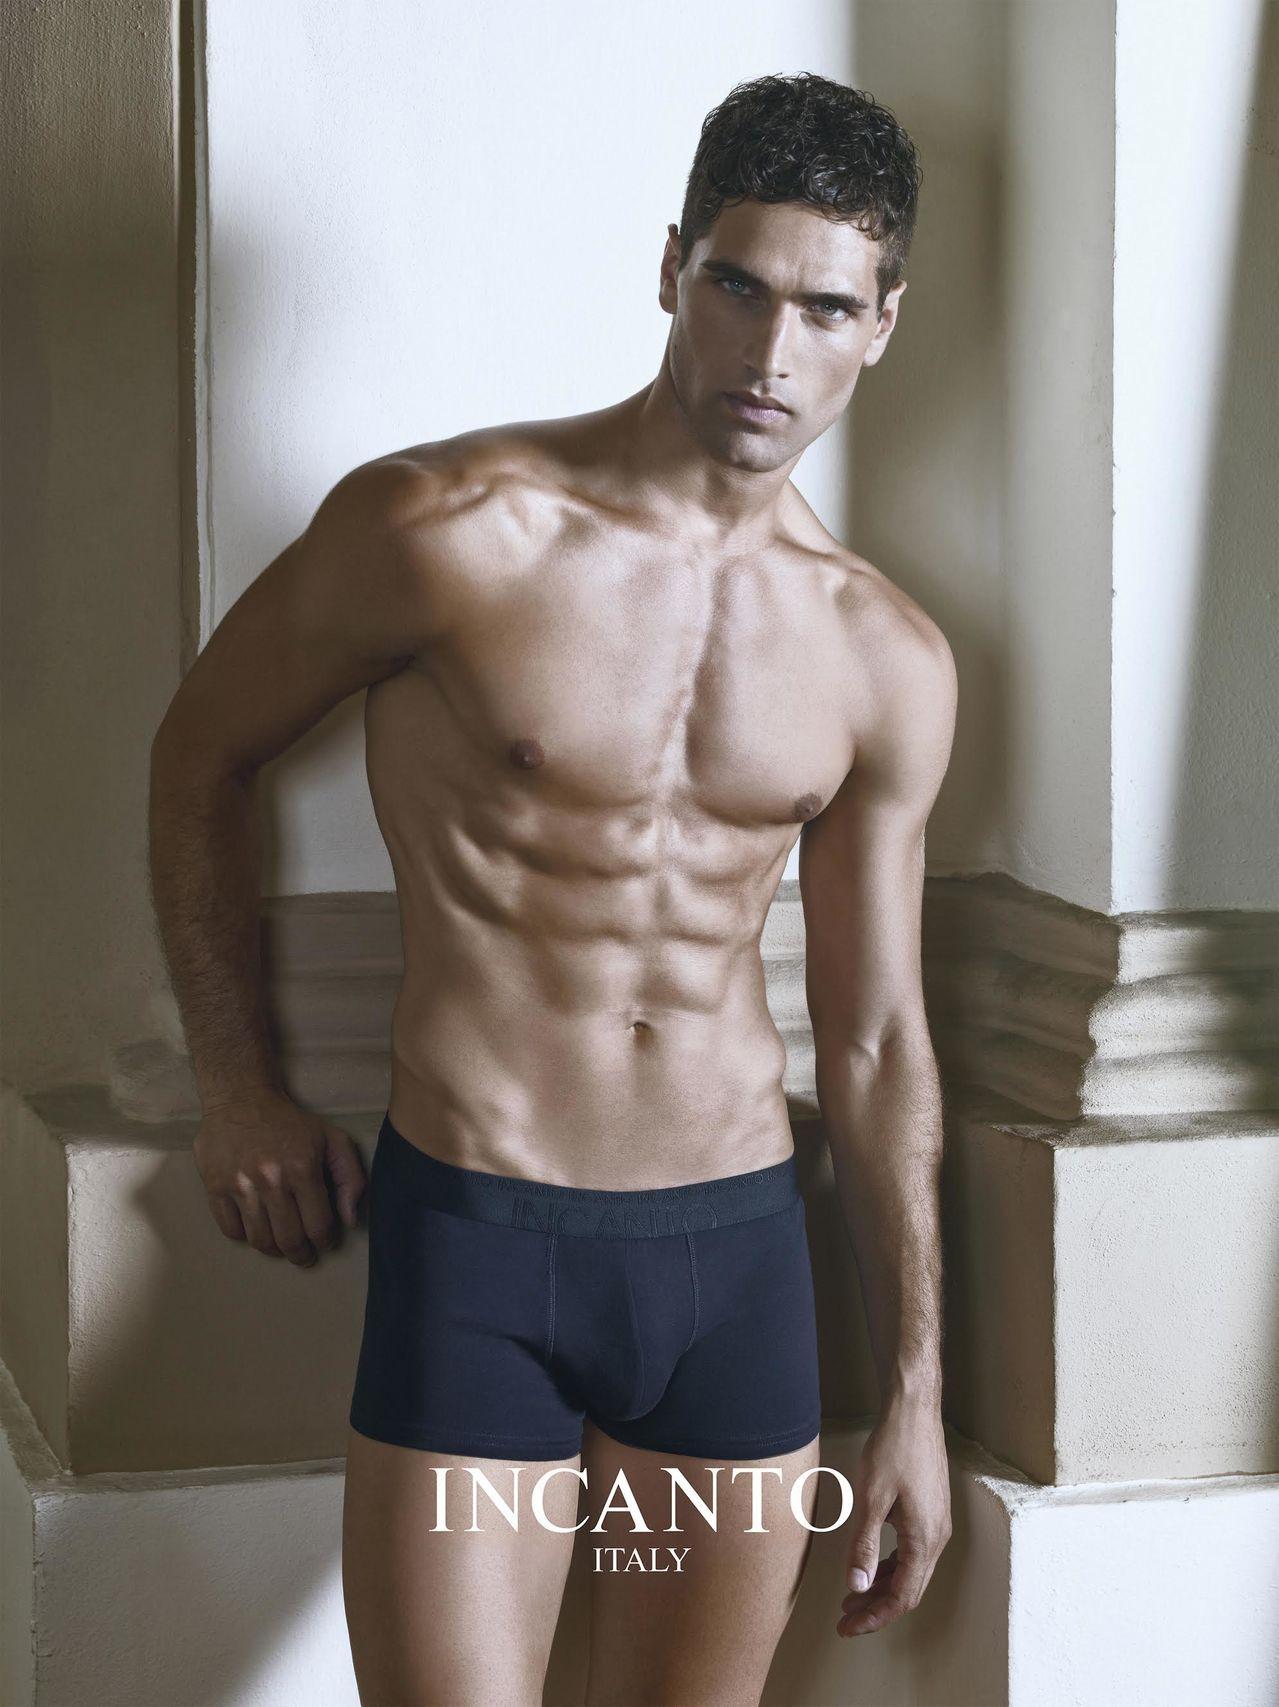 No ties management models deimante guobyte - Soul Artist Management Model Fabio Mancini Behind The Scenes For Incanto Underwear Shot By Joseph Cardo